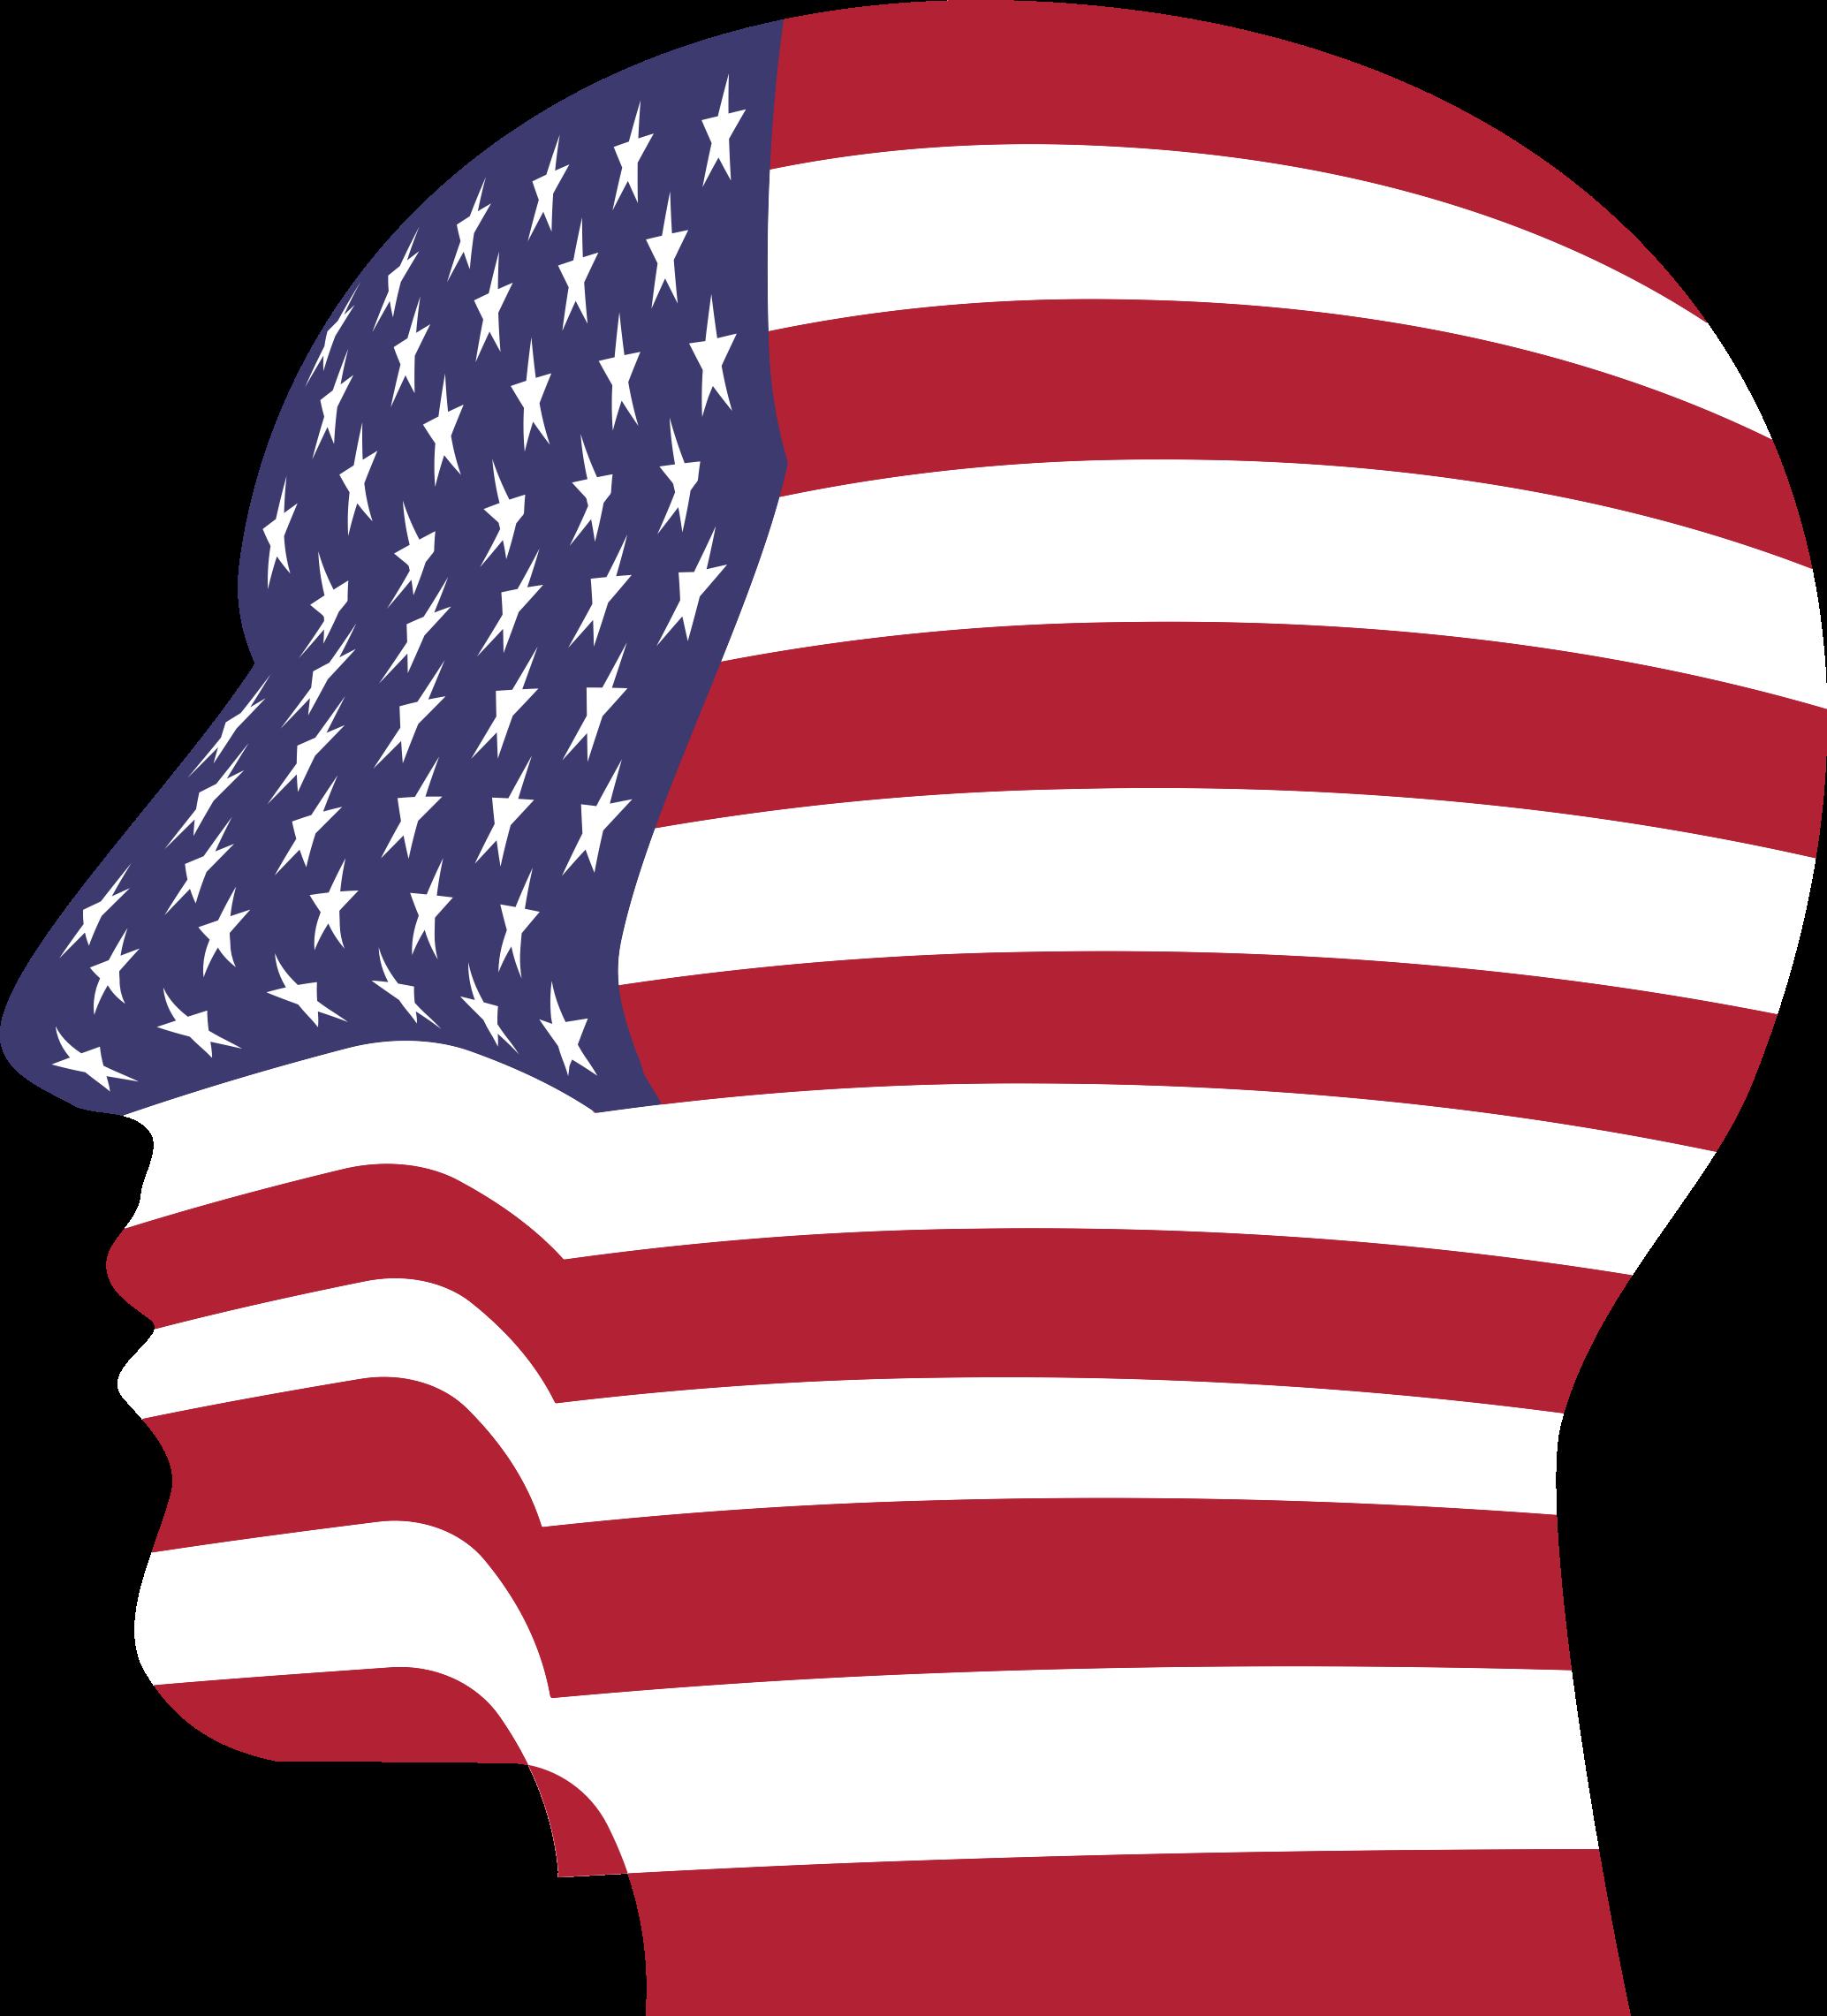 America clipart head. Man flag big image